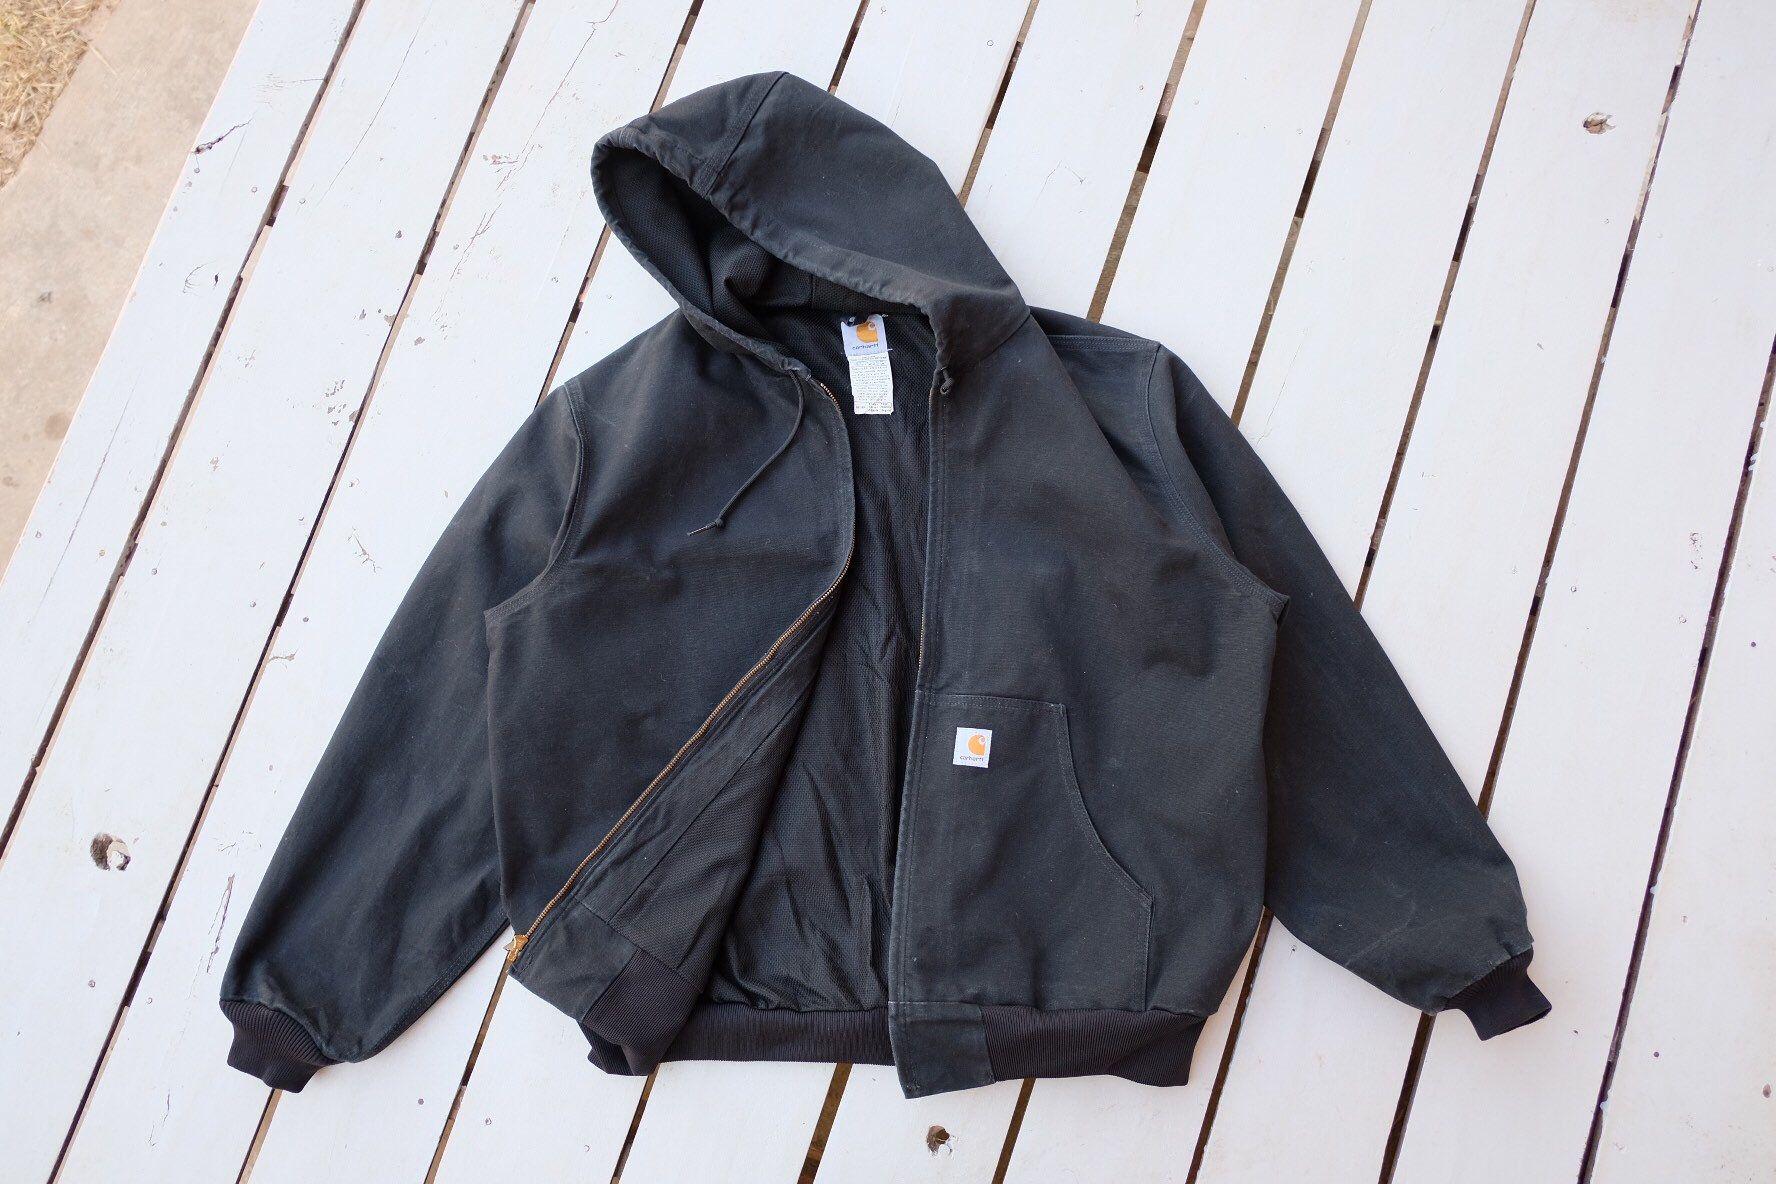 Rare Carhartt Jacket Carhartt Workwear Hoodie And Zipper Etsy Carhartt Workwear Carhartt Jacket Jackets [ 1184 x 1776 Pixel ]